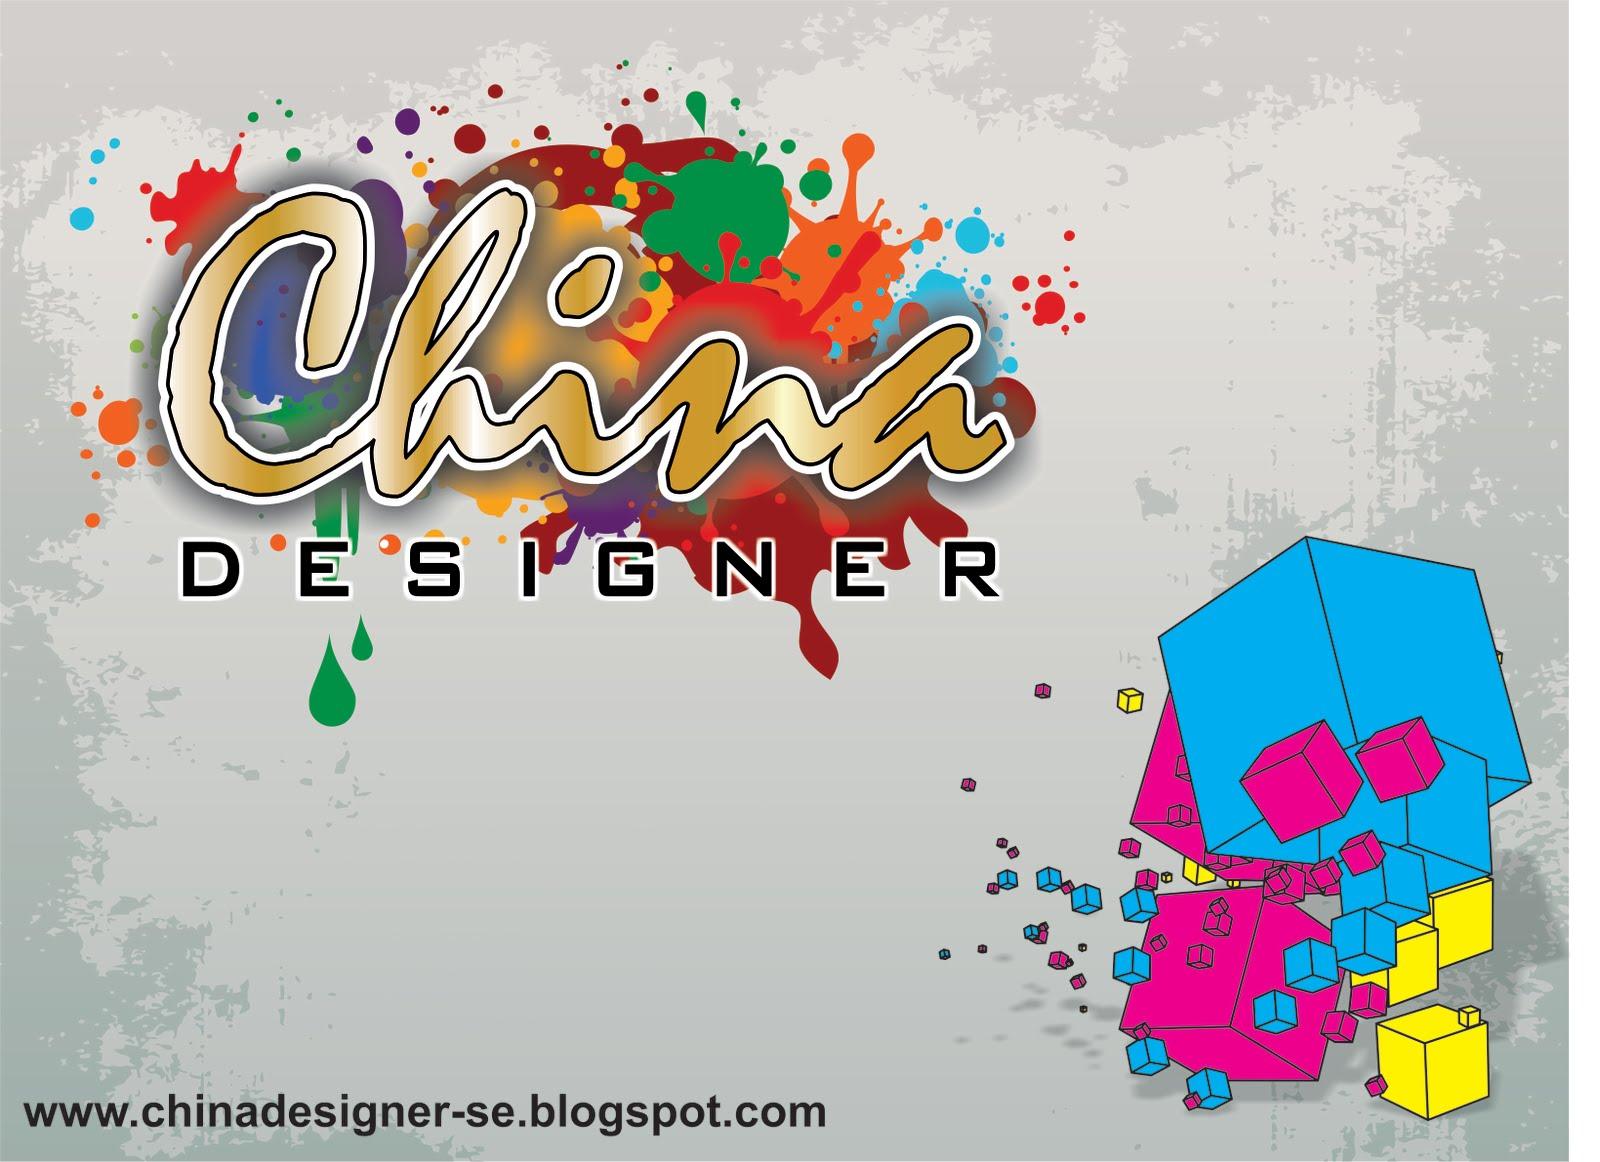 http://3.bp.blogspot.com/-KF8iMCCstbk/ThzWsVNSbcI/AAAAAAAAAKQ/rtfBA2PsNPk/s1600/China+Designer.jpg